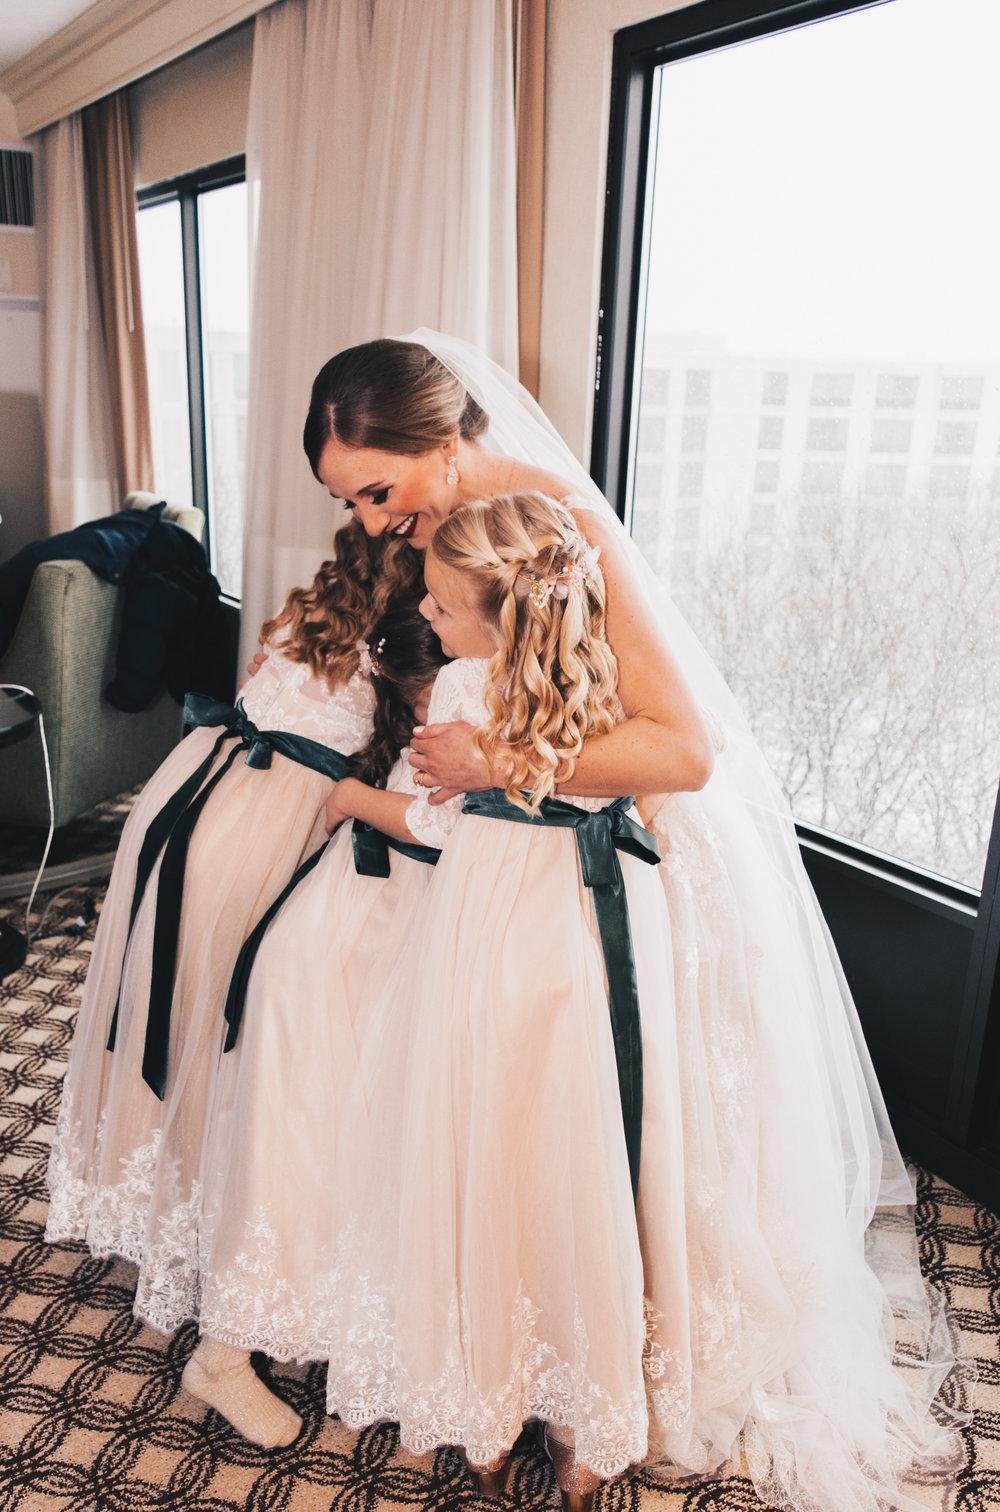 Winter Wedding, Chicago Winter Wedding, Chicago Wedding Photographer, Illinois Wedding, Illinois Wedding Photographer, Classy Modern Wedding, Wedding Getting Ready Photos